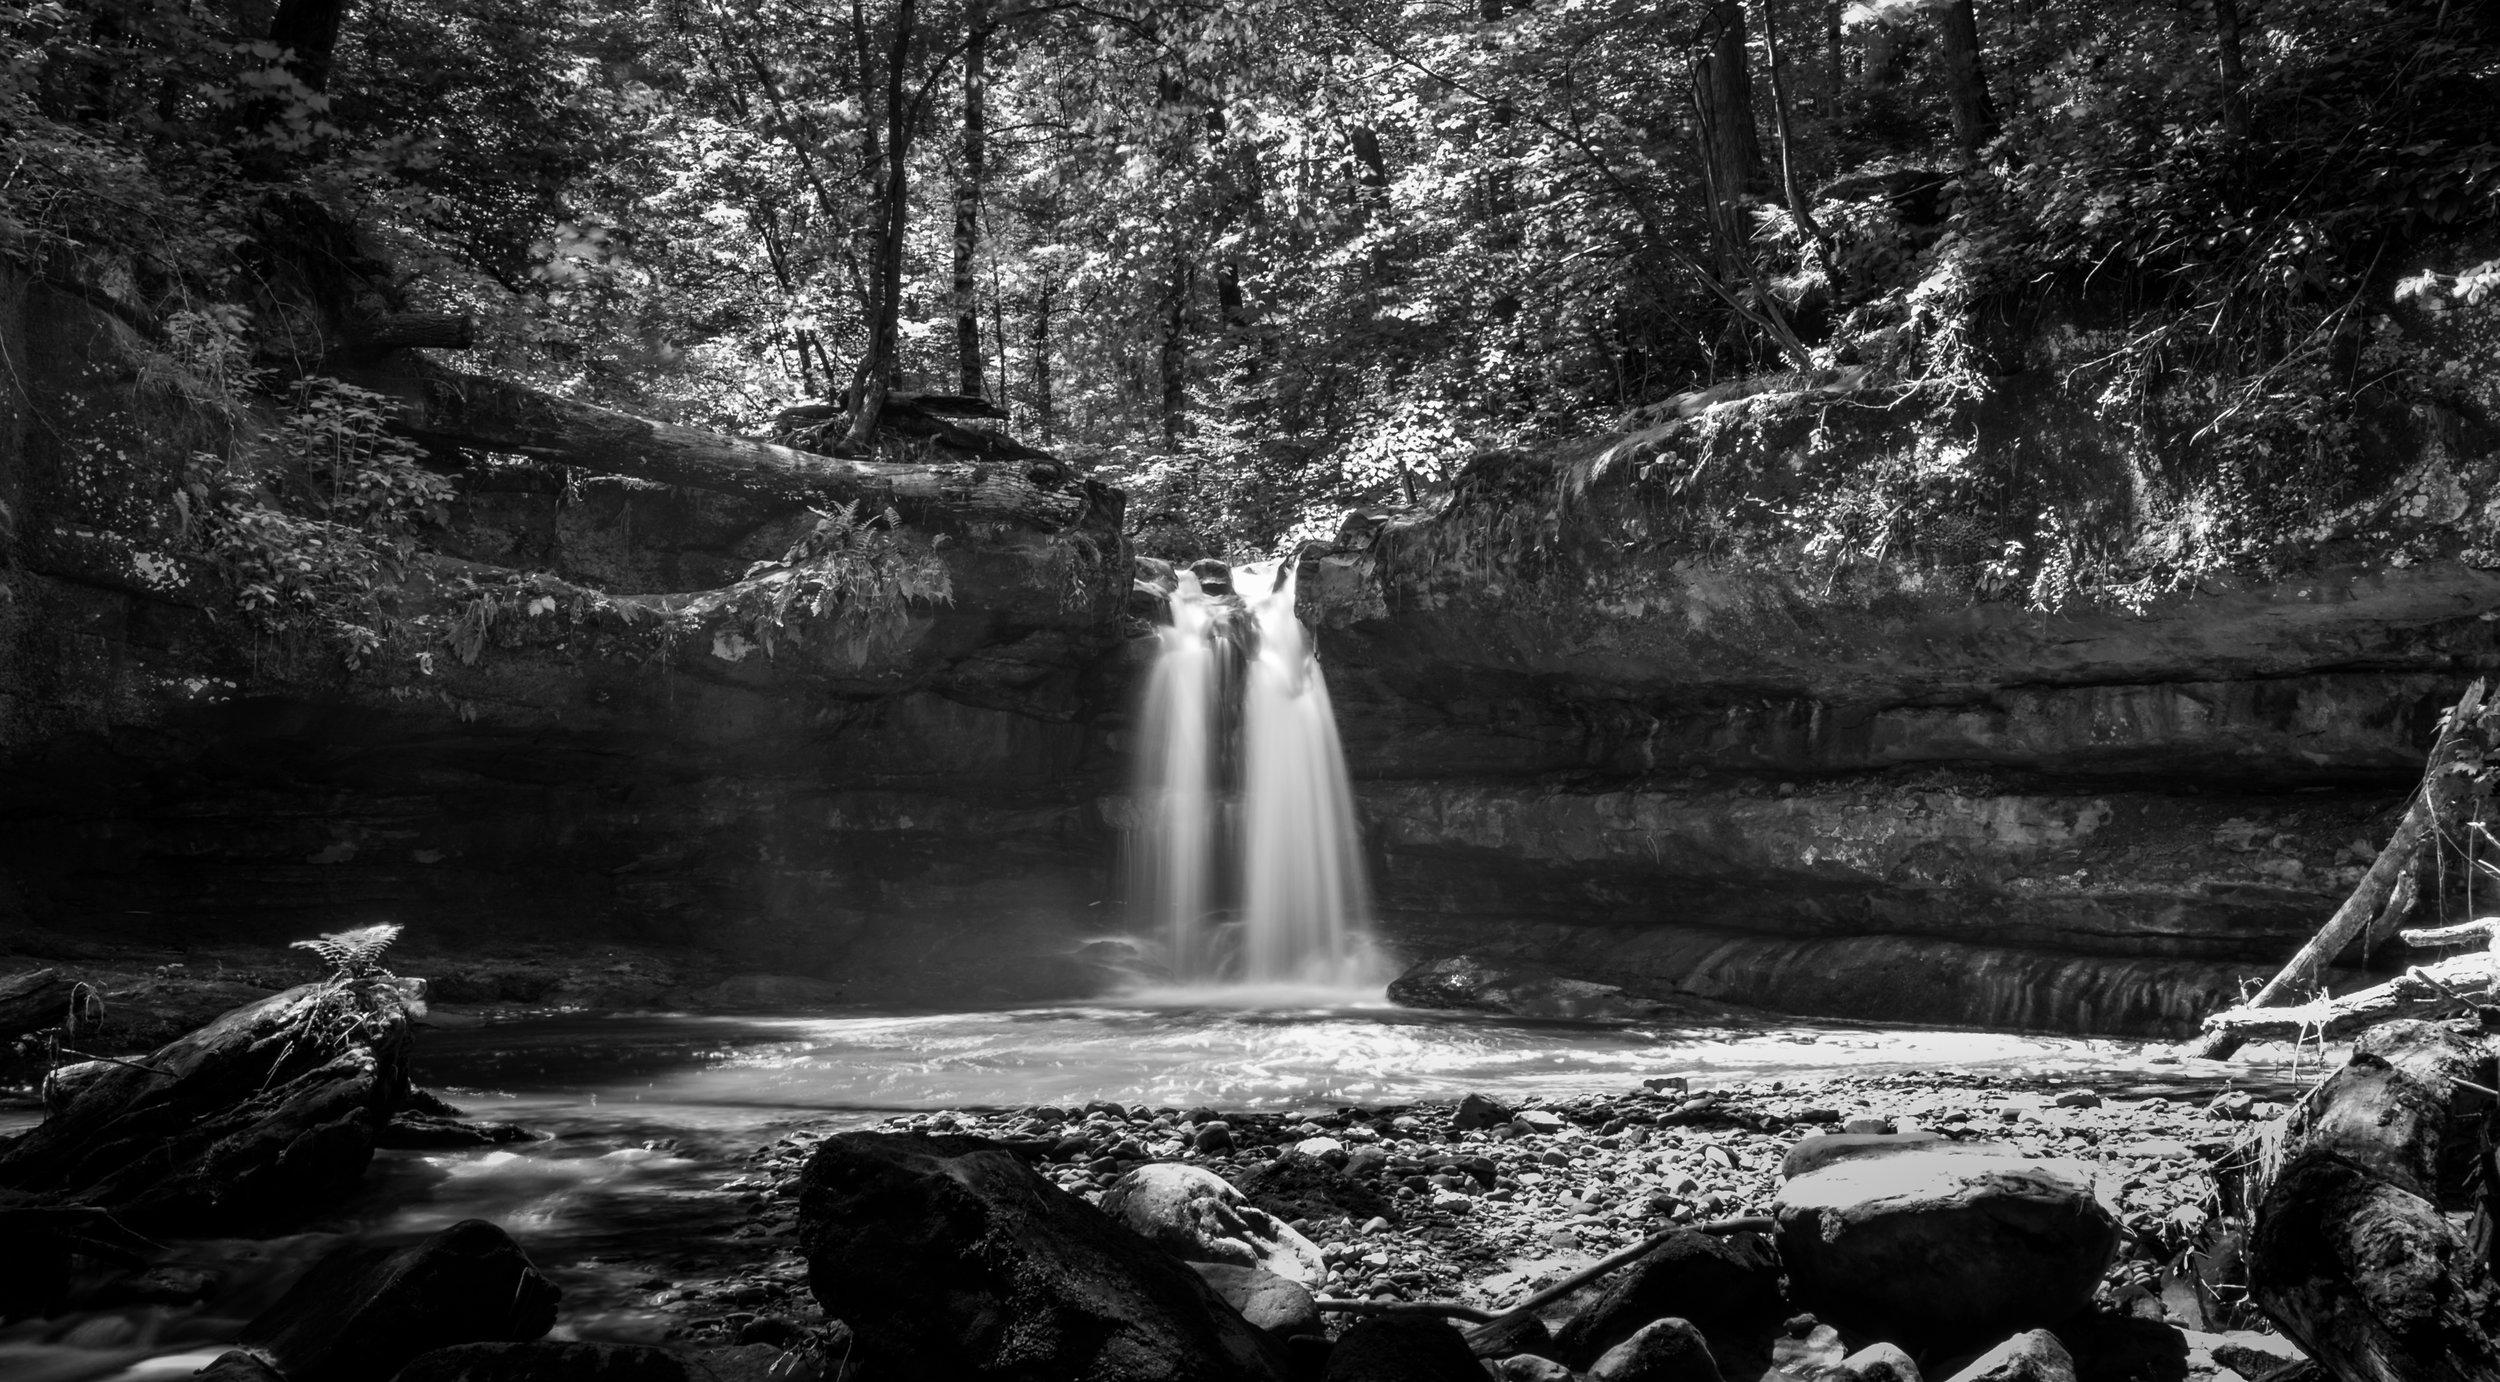 Flemings Falls - Camp Mowana (Mansfield, Ohio)